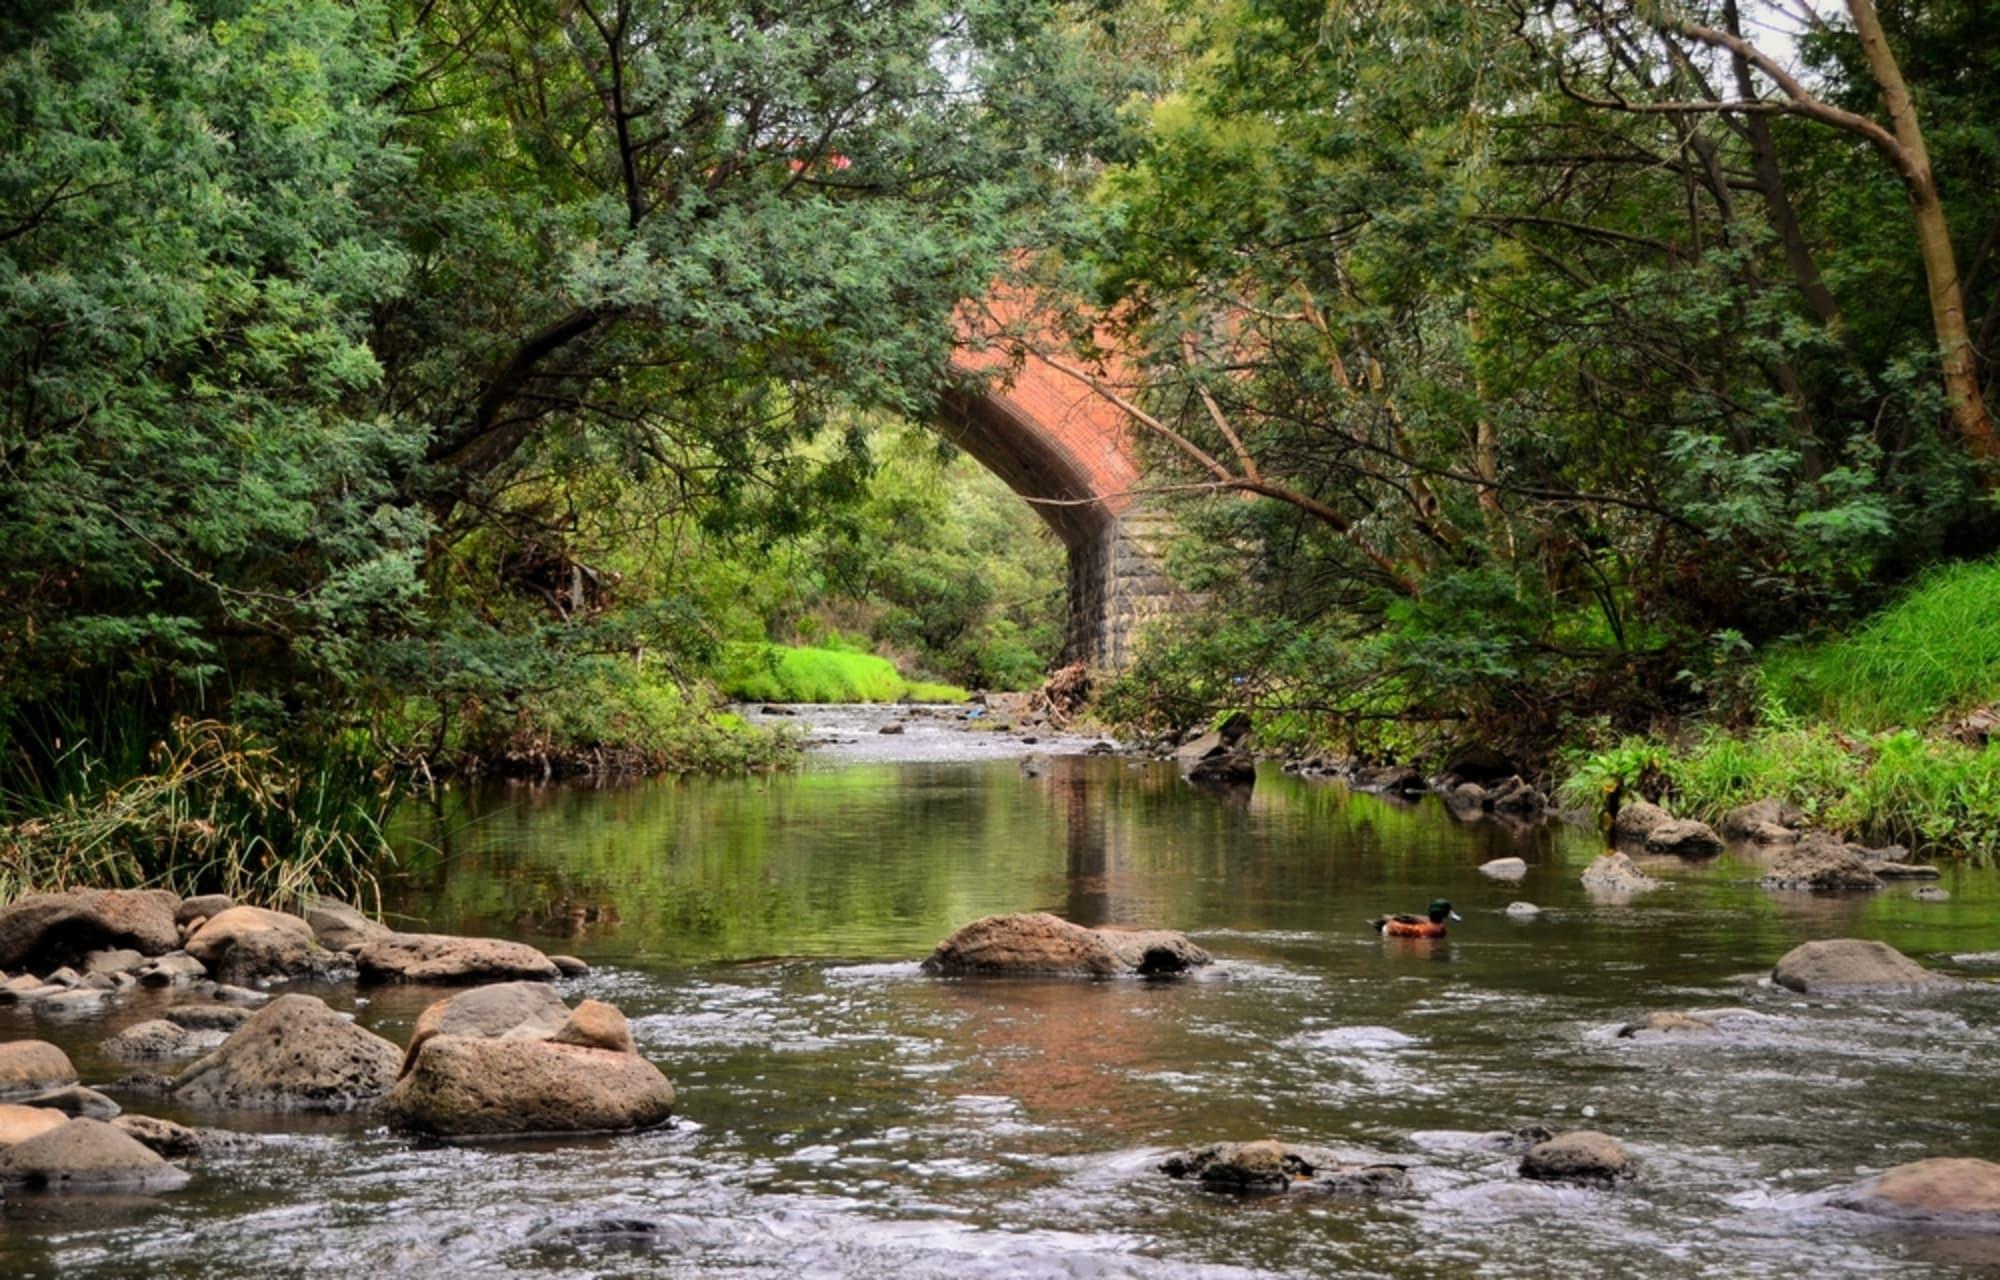 Melbourne - Meet me on the Merri